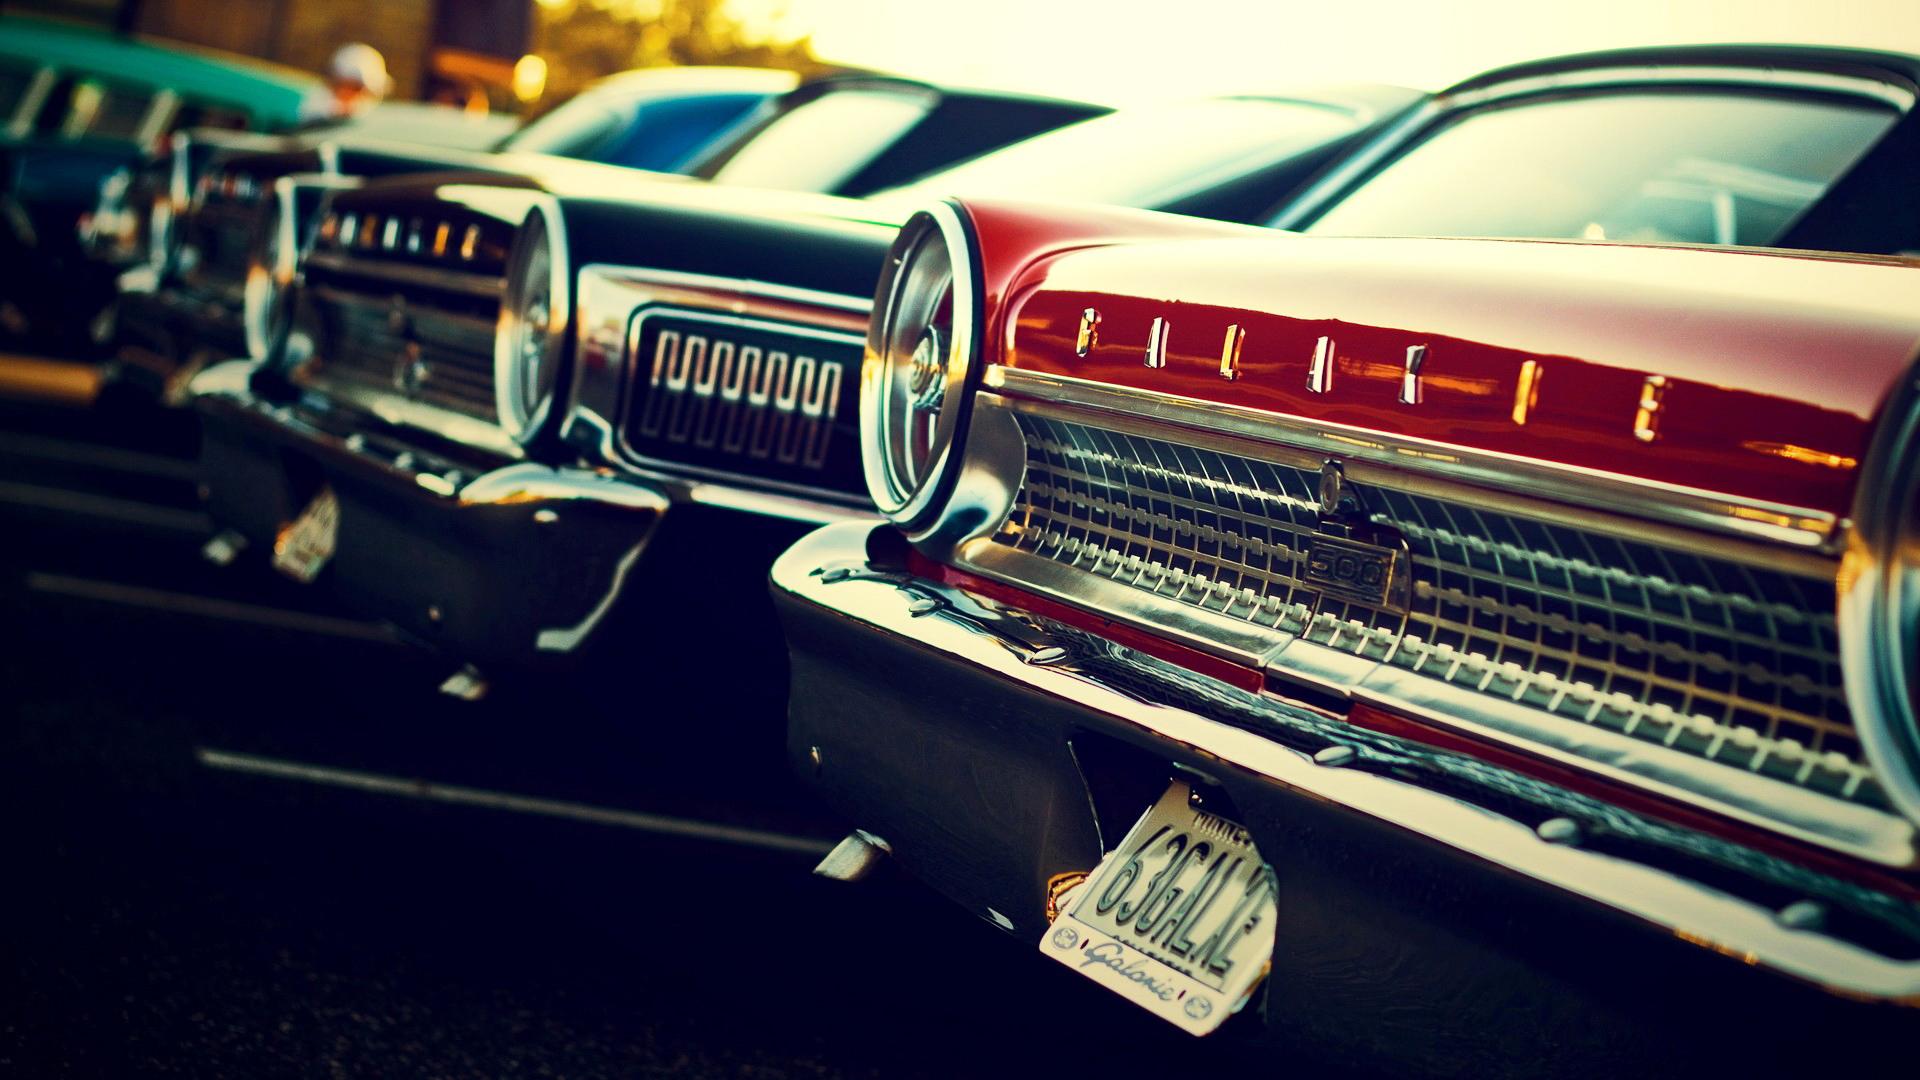 classic-cars-wallpaper-1920x1080-Wallpapers-HD-1080p-Desktop-...